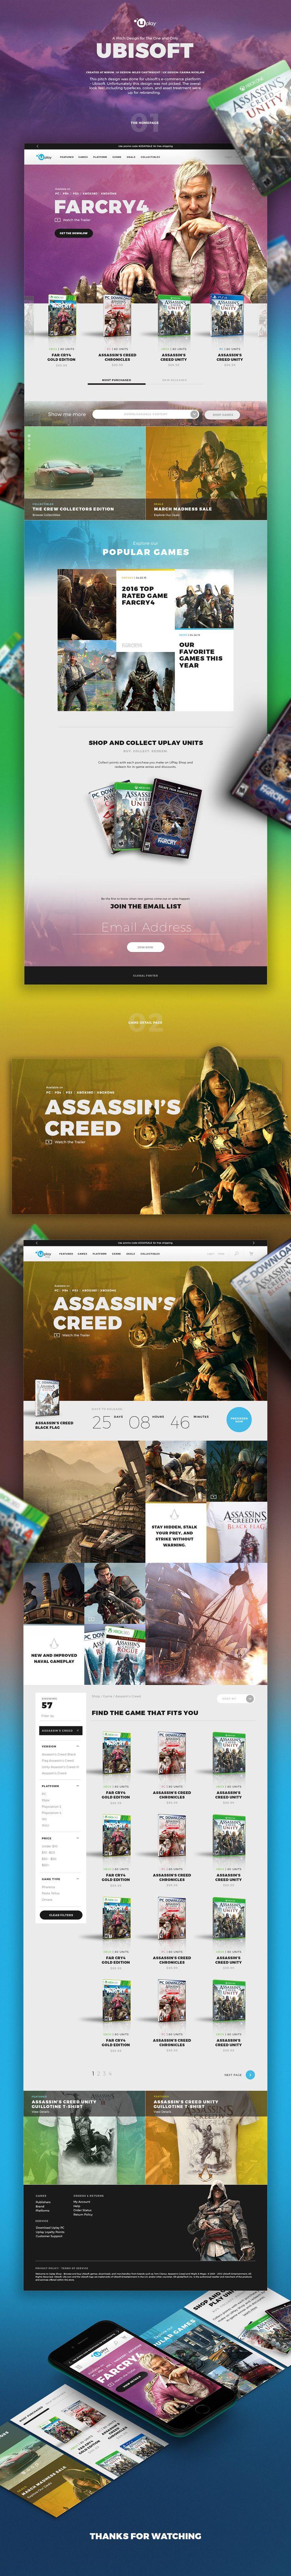 Ubisoft Web Design on Behance